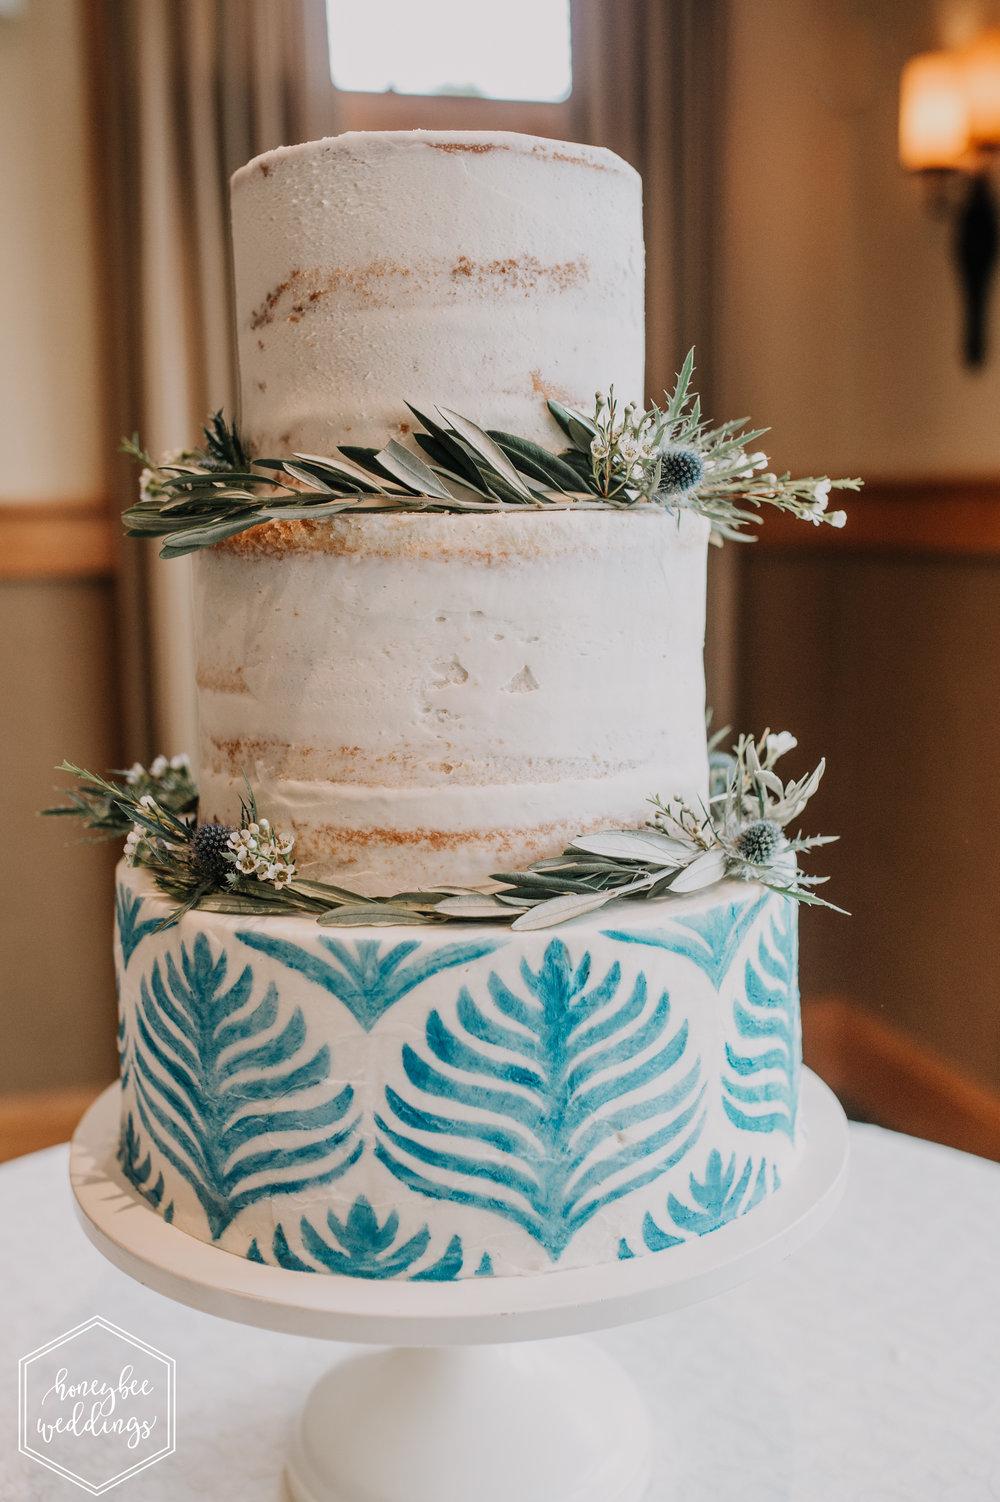 430 Riverside Country Club Wedding_Montana Wedding Photographer_Lauren Jackson + Evan Ivaldi 2018-7994.jpg